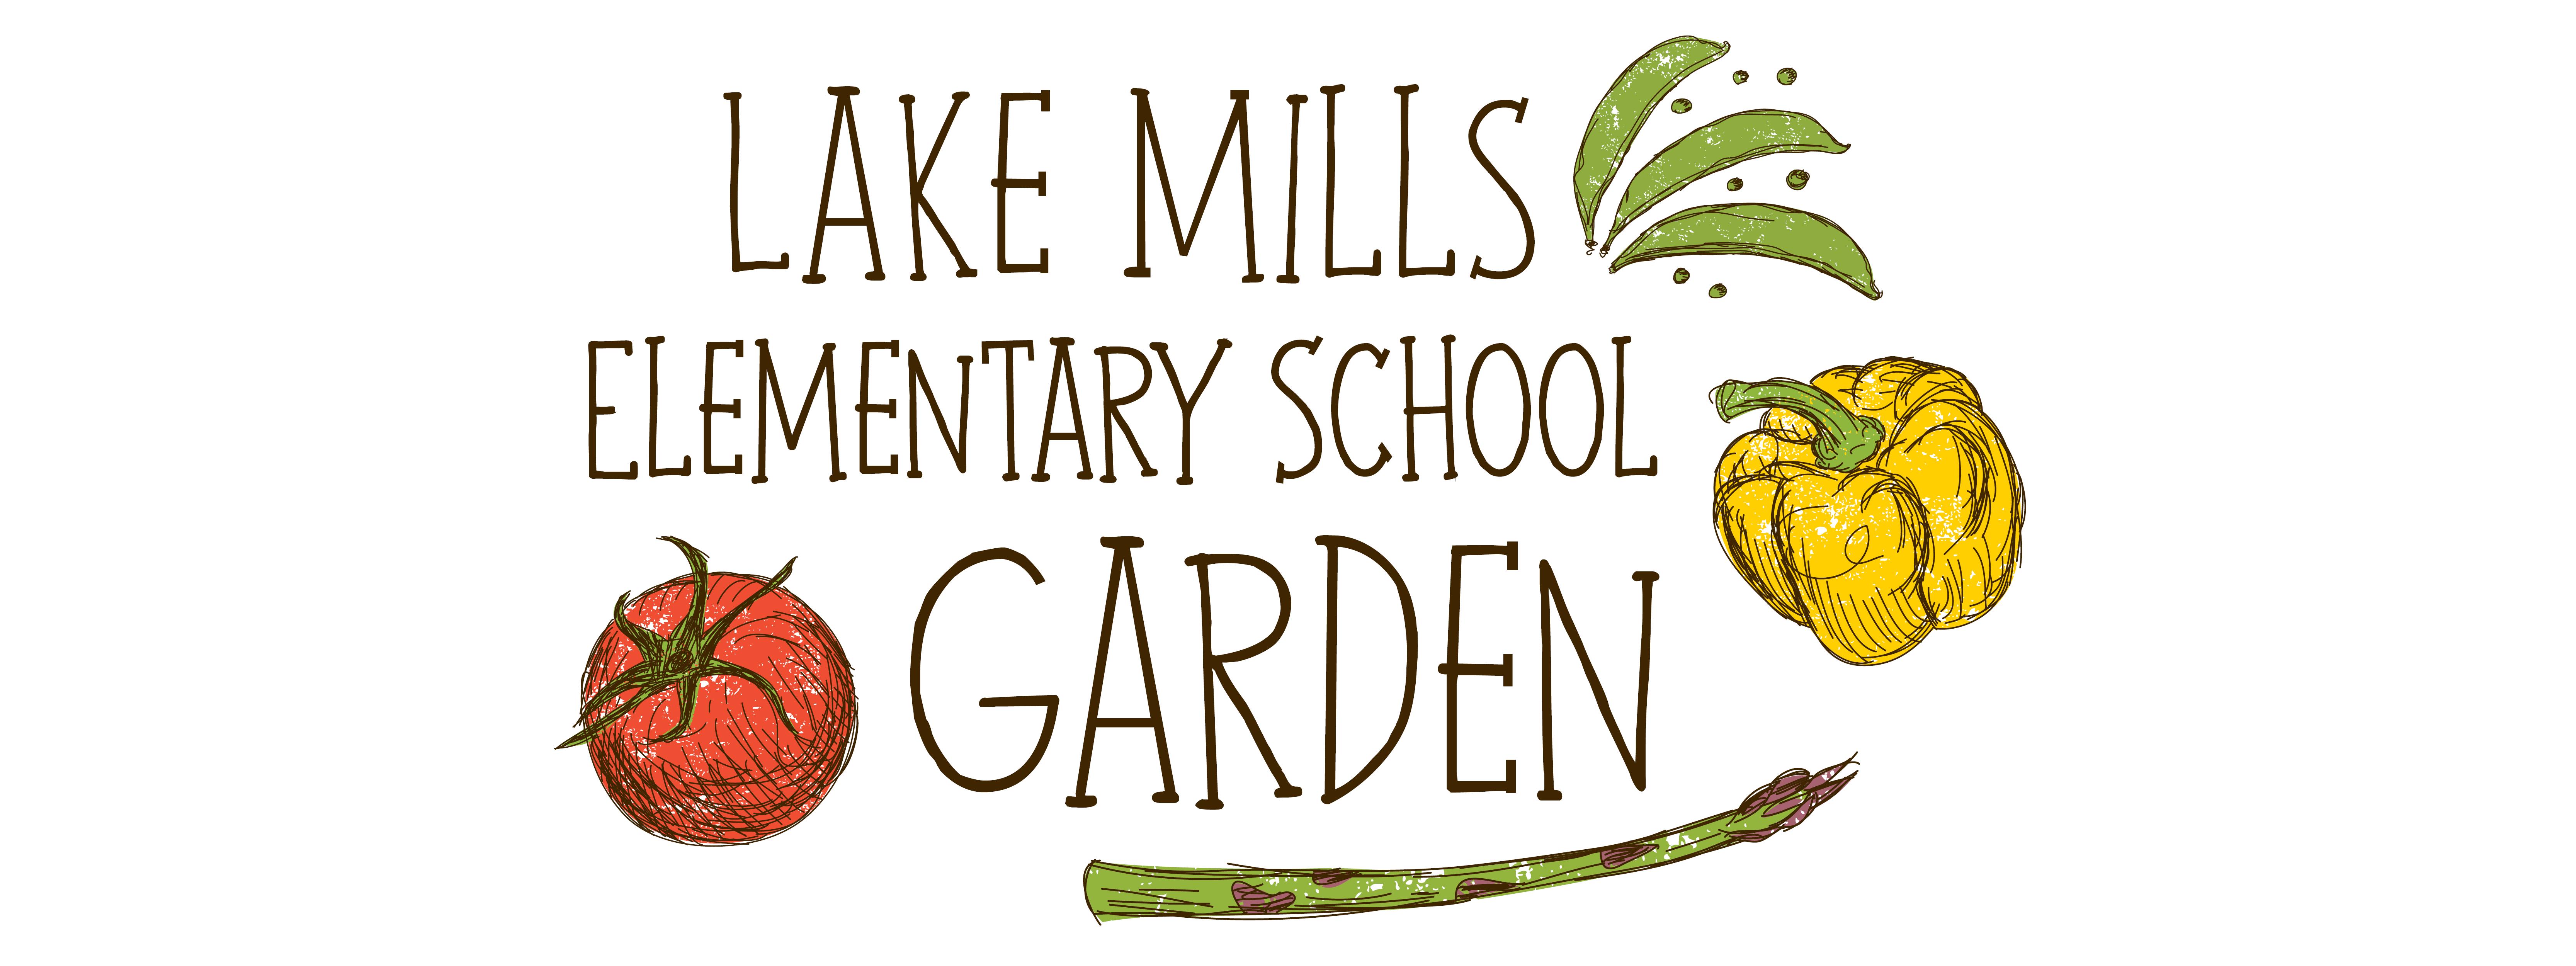 Lake Mills Elementary Garden